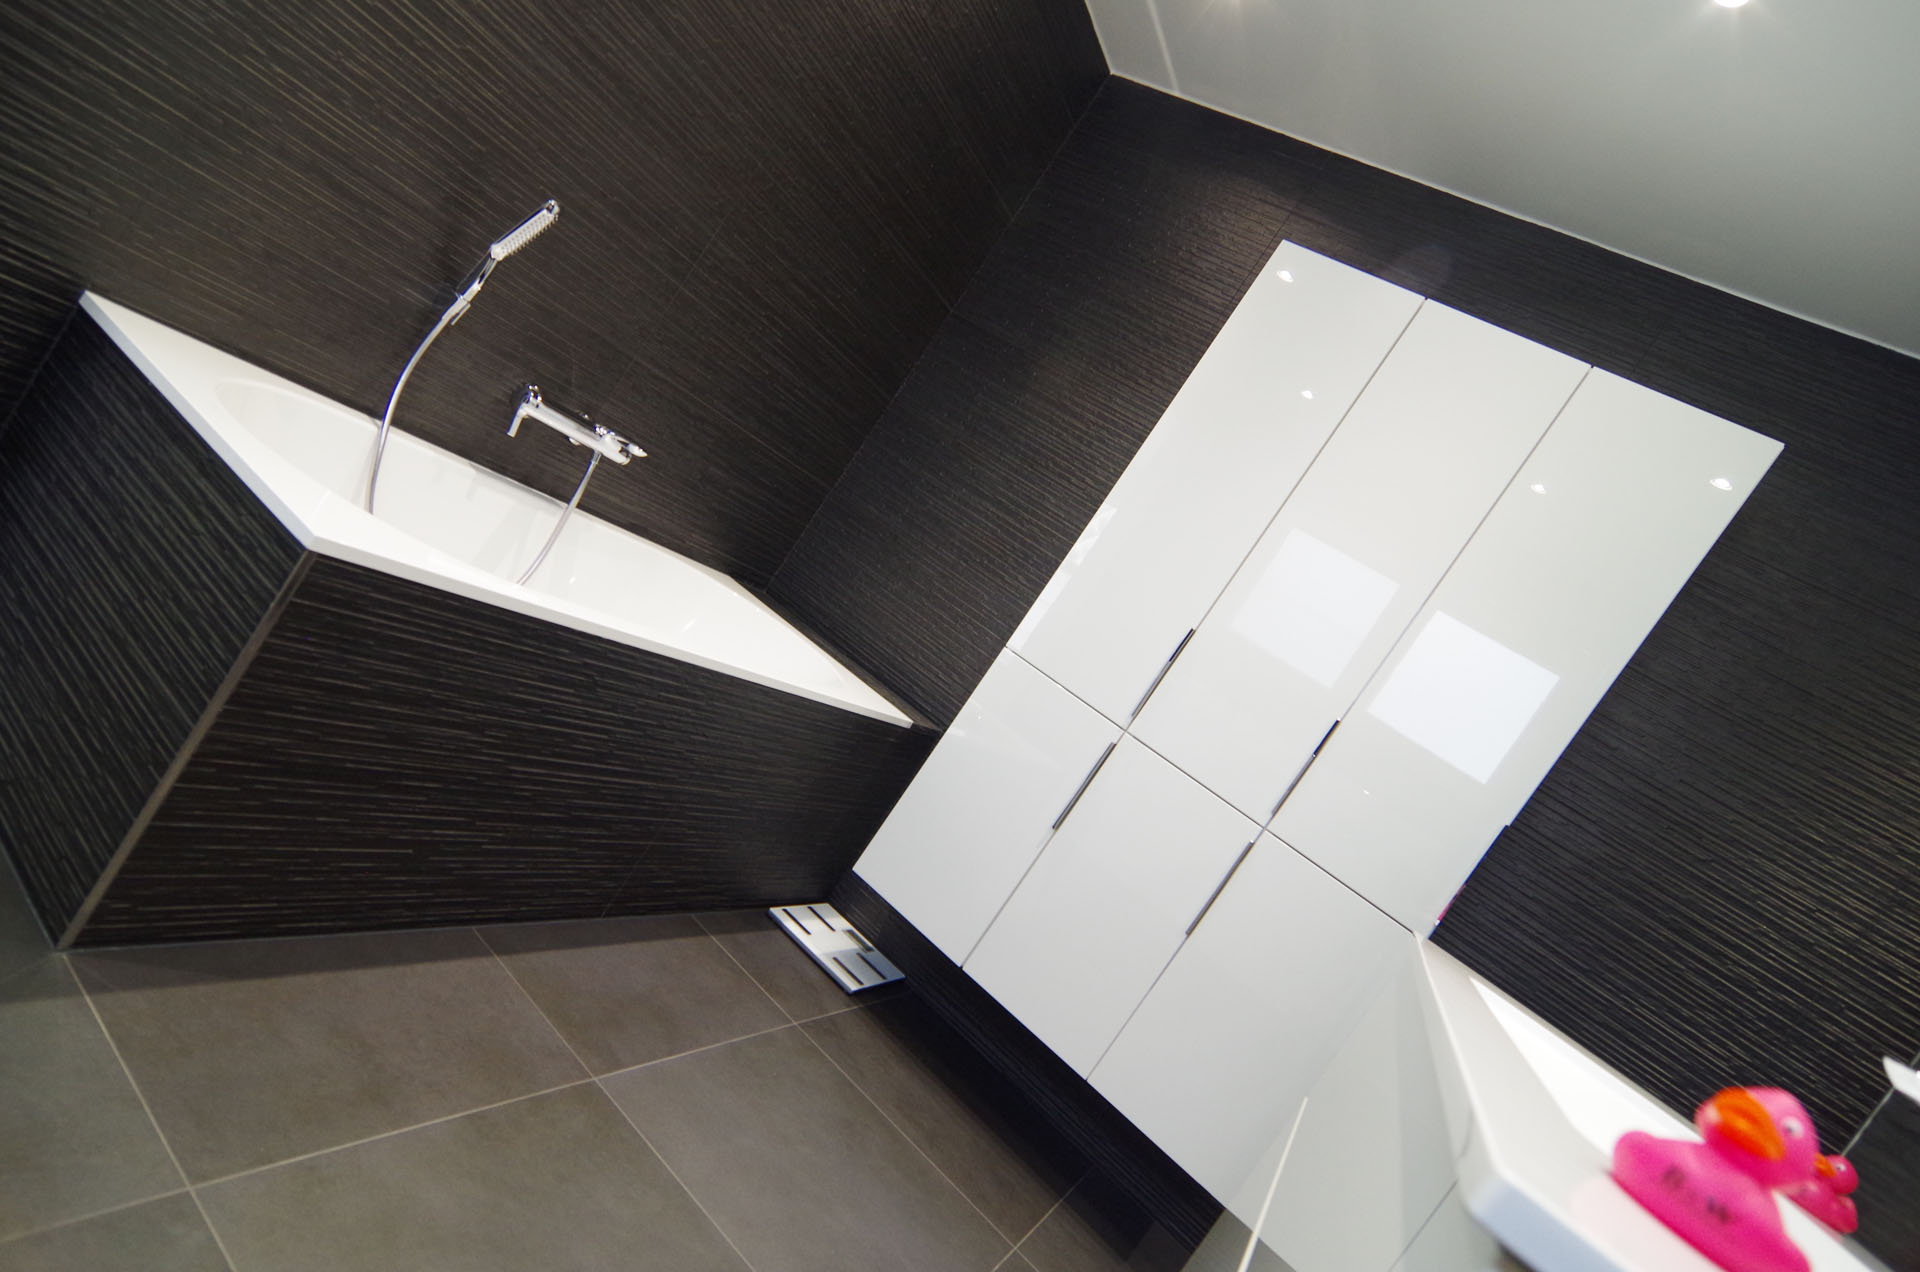 B&W Badkamers   Badkamers en badkamerrenovatie in Heist-op-den-Berg   Moderne zwart-wit badkamer